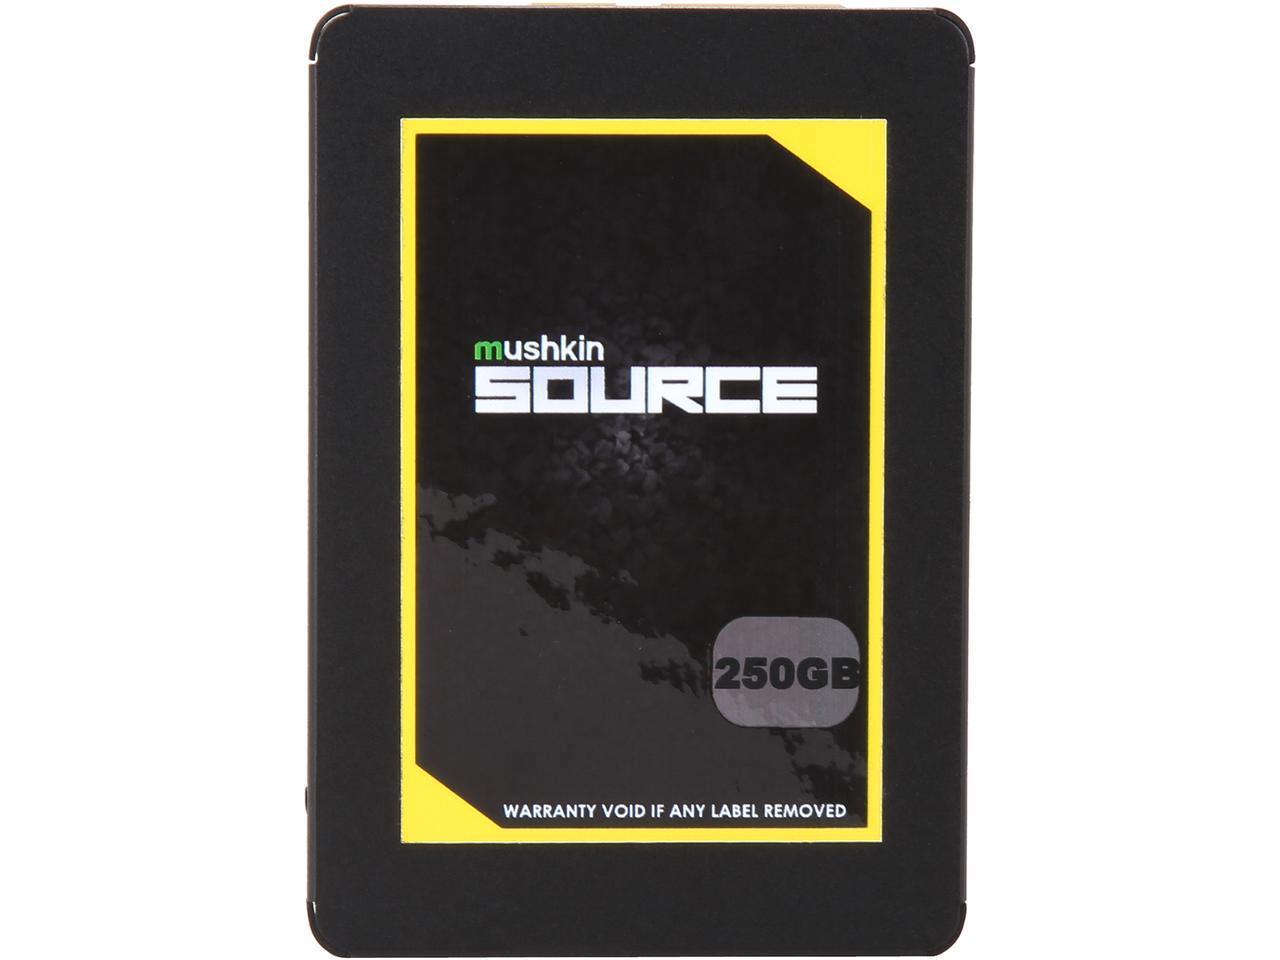 "250 GB Mushkin Enhanced Source 2.5"" SATA III 3D TLC Internal Solid State Drive for $54.99 + Free Ship @ Newegg"